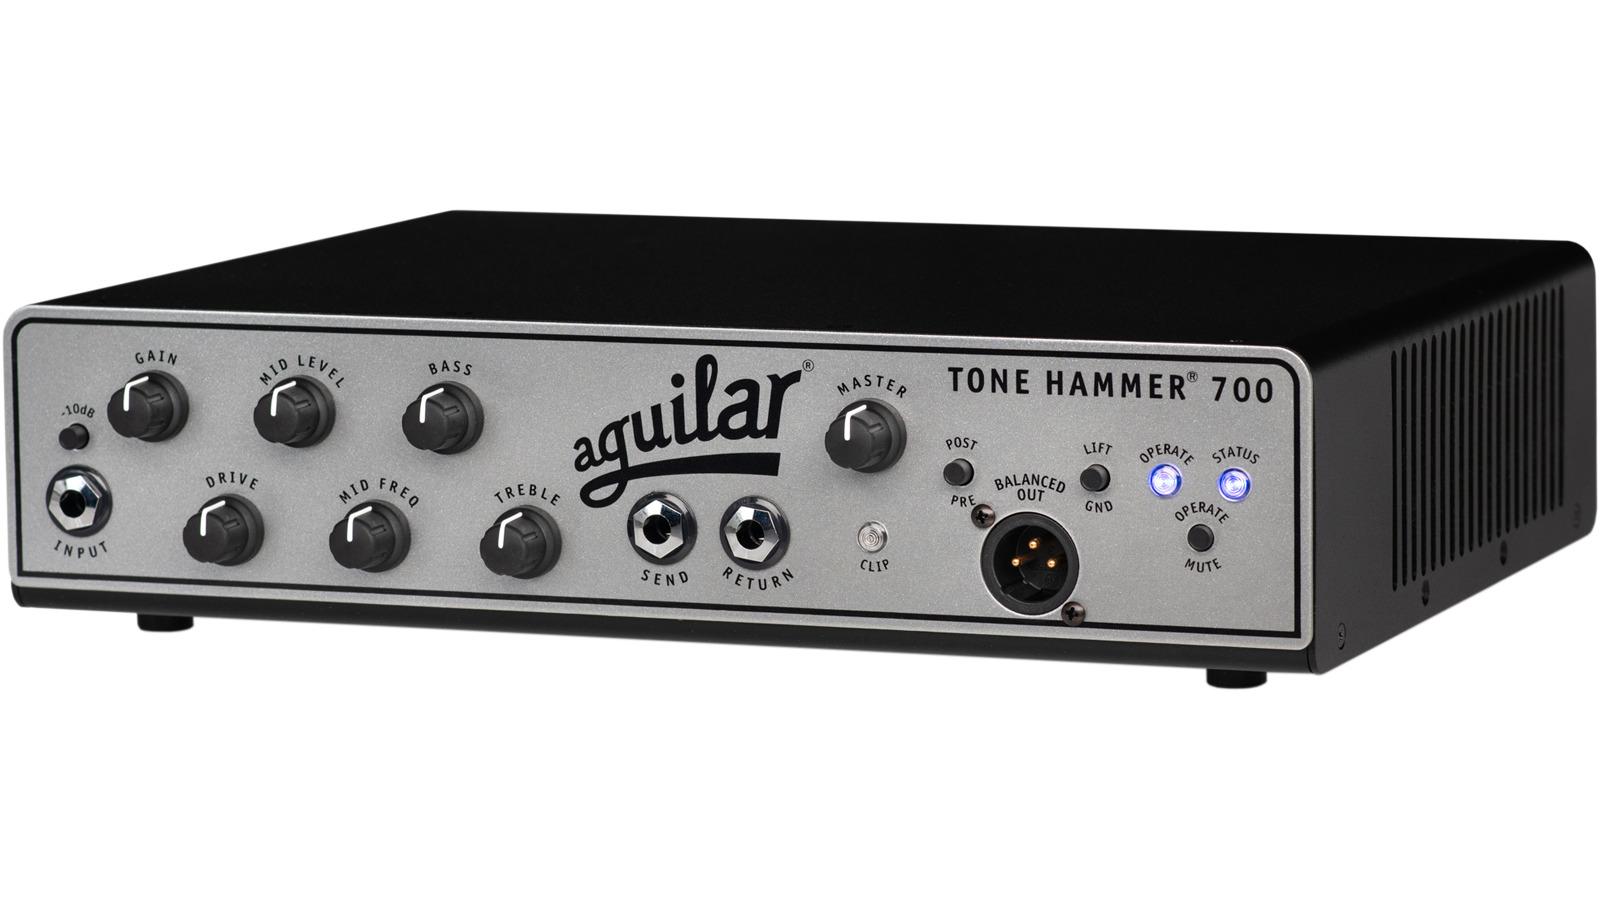 Aguilar TH700 Tone Hammer 700